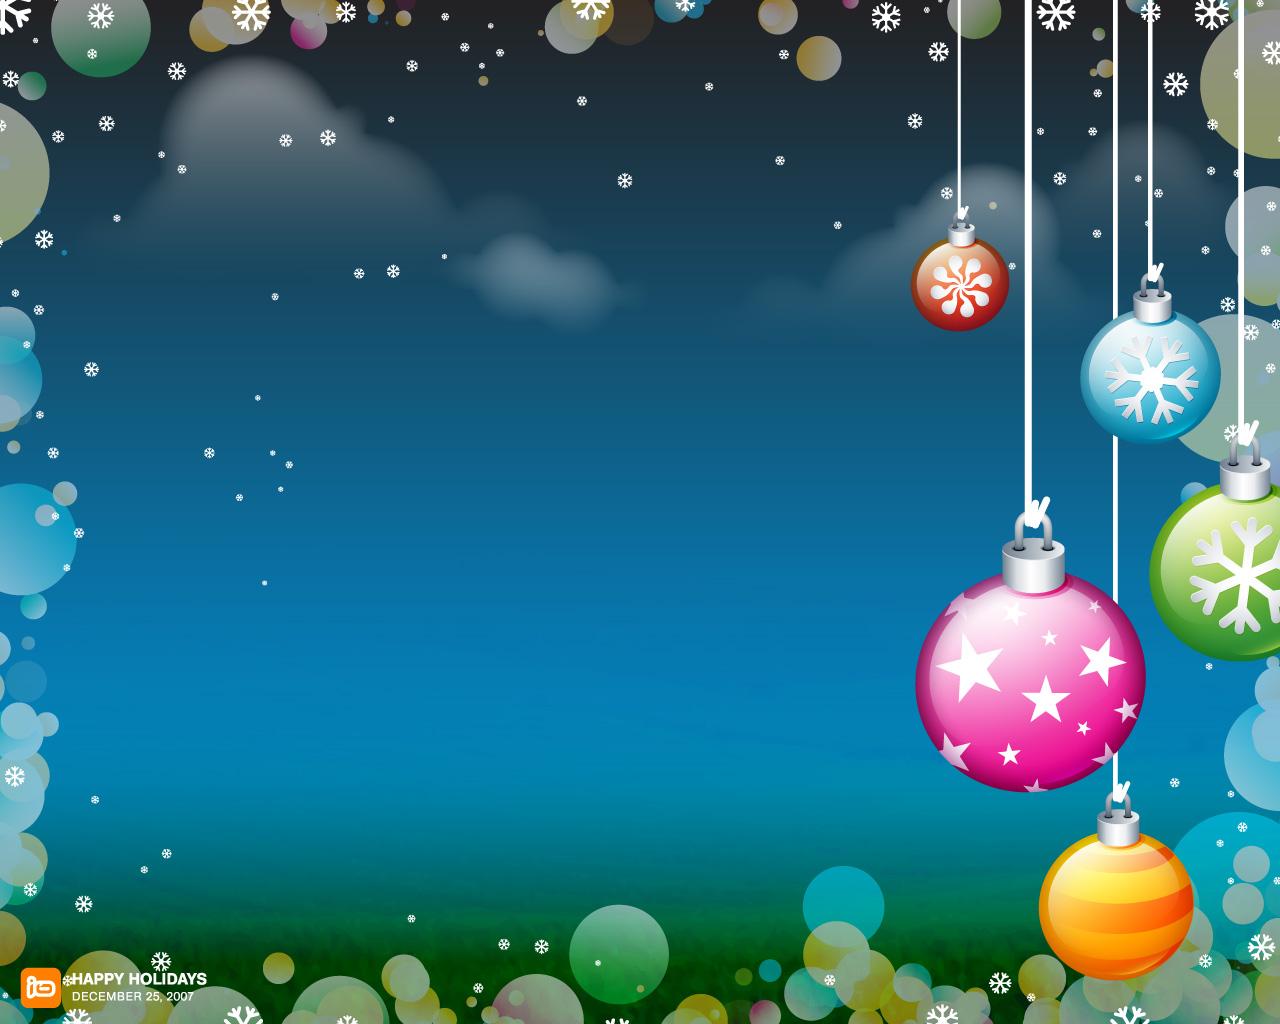 Christmas Xmas wallpapers 1280x1024